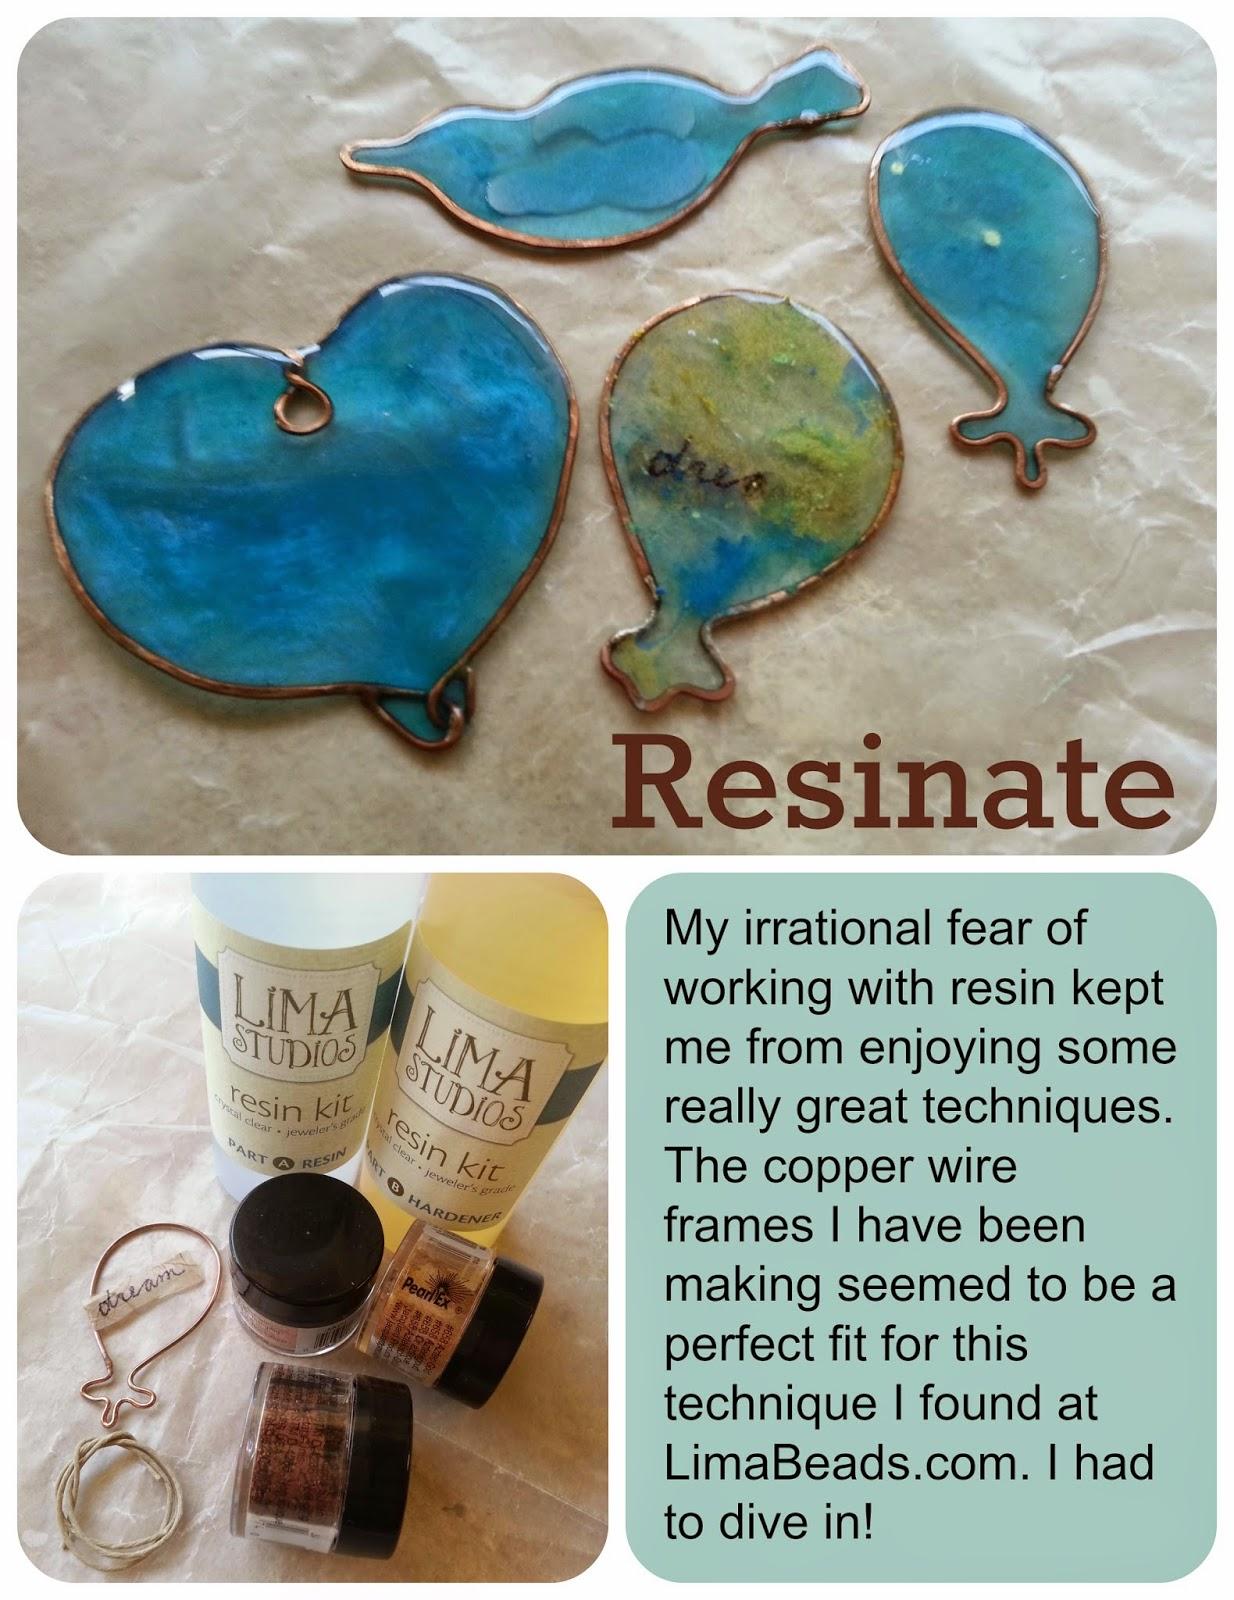 Gaea Ceramic Bead and Art Studio Blog: Resonates With Me - Resin ...